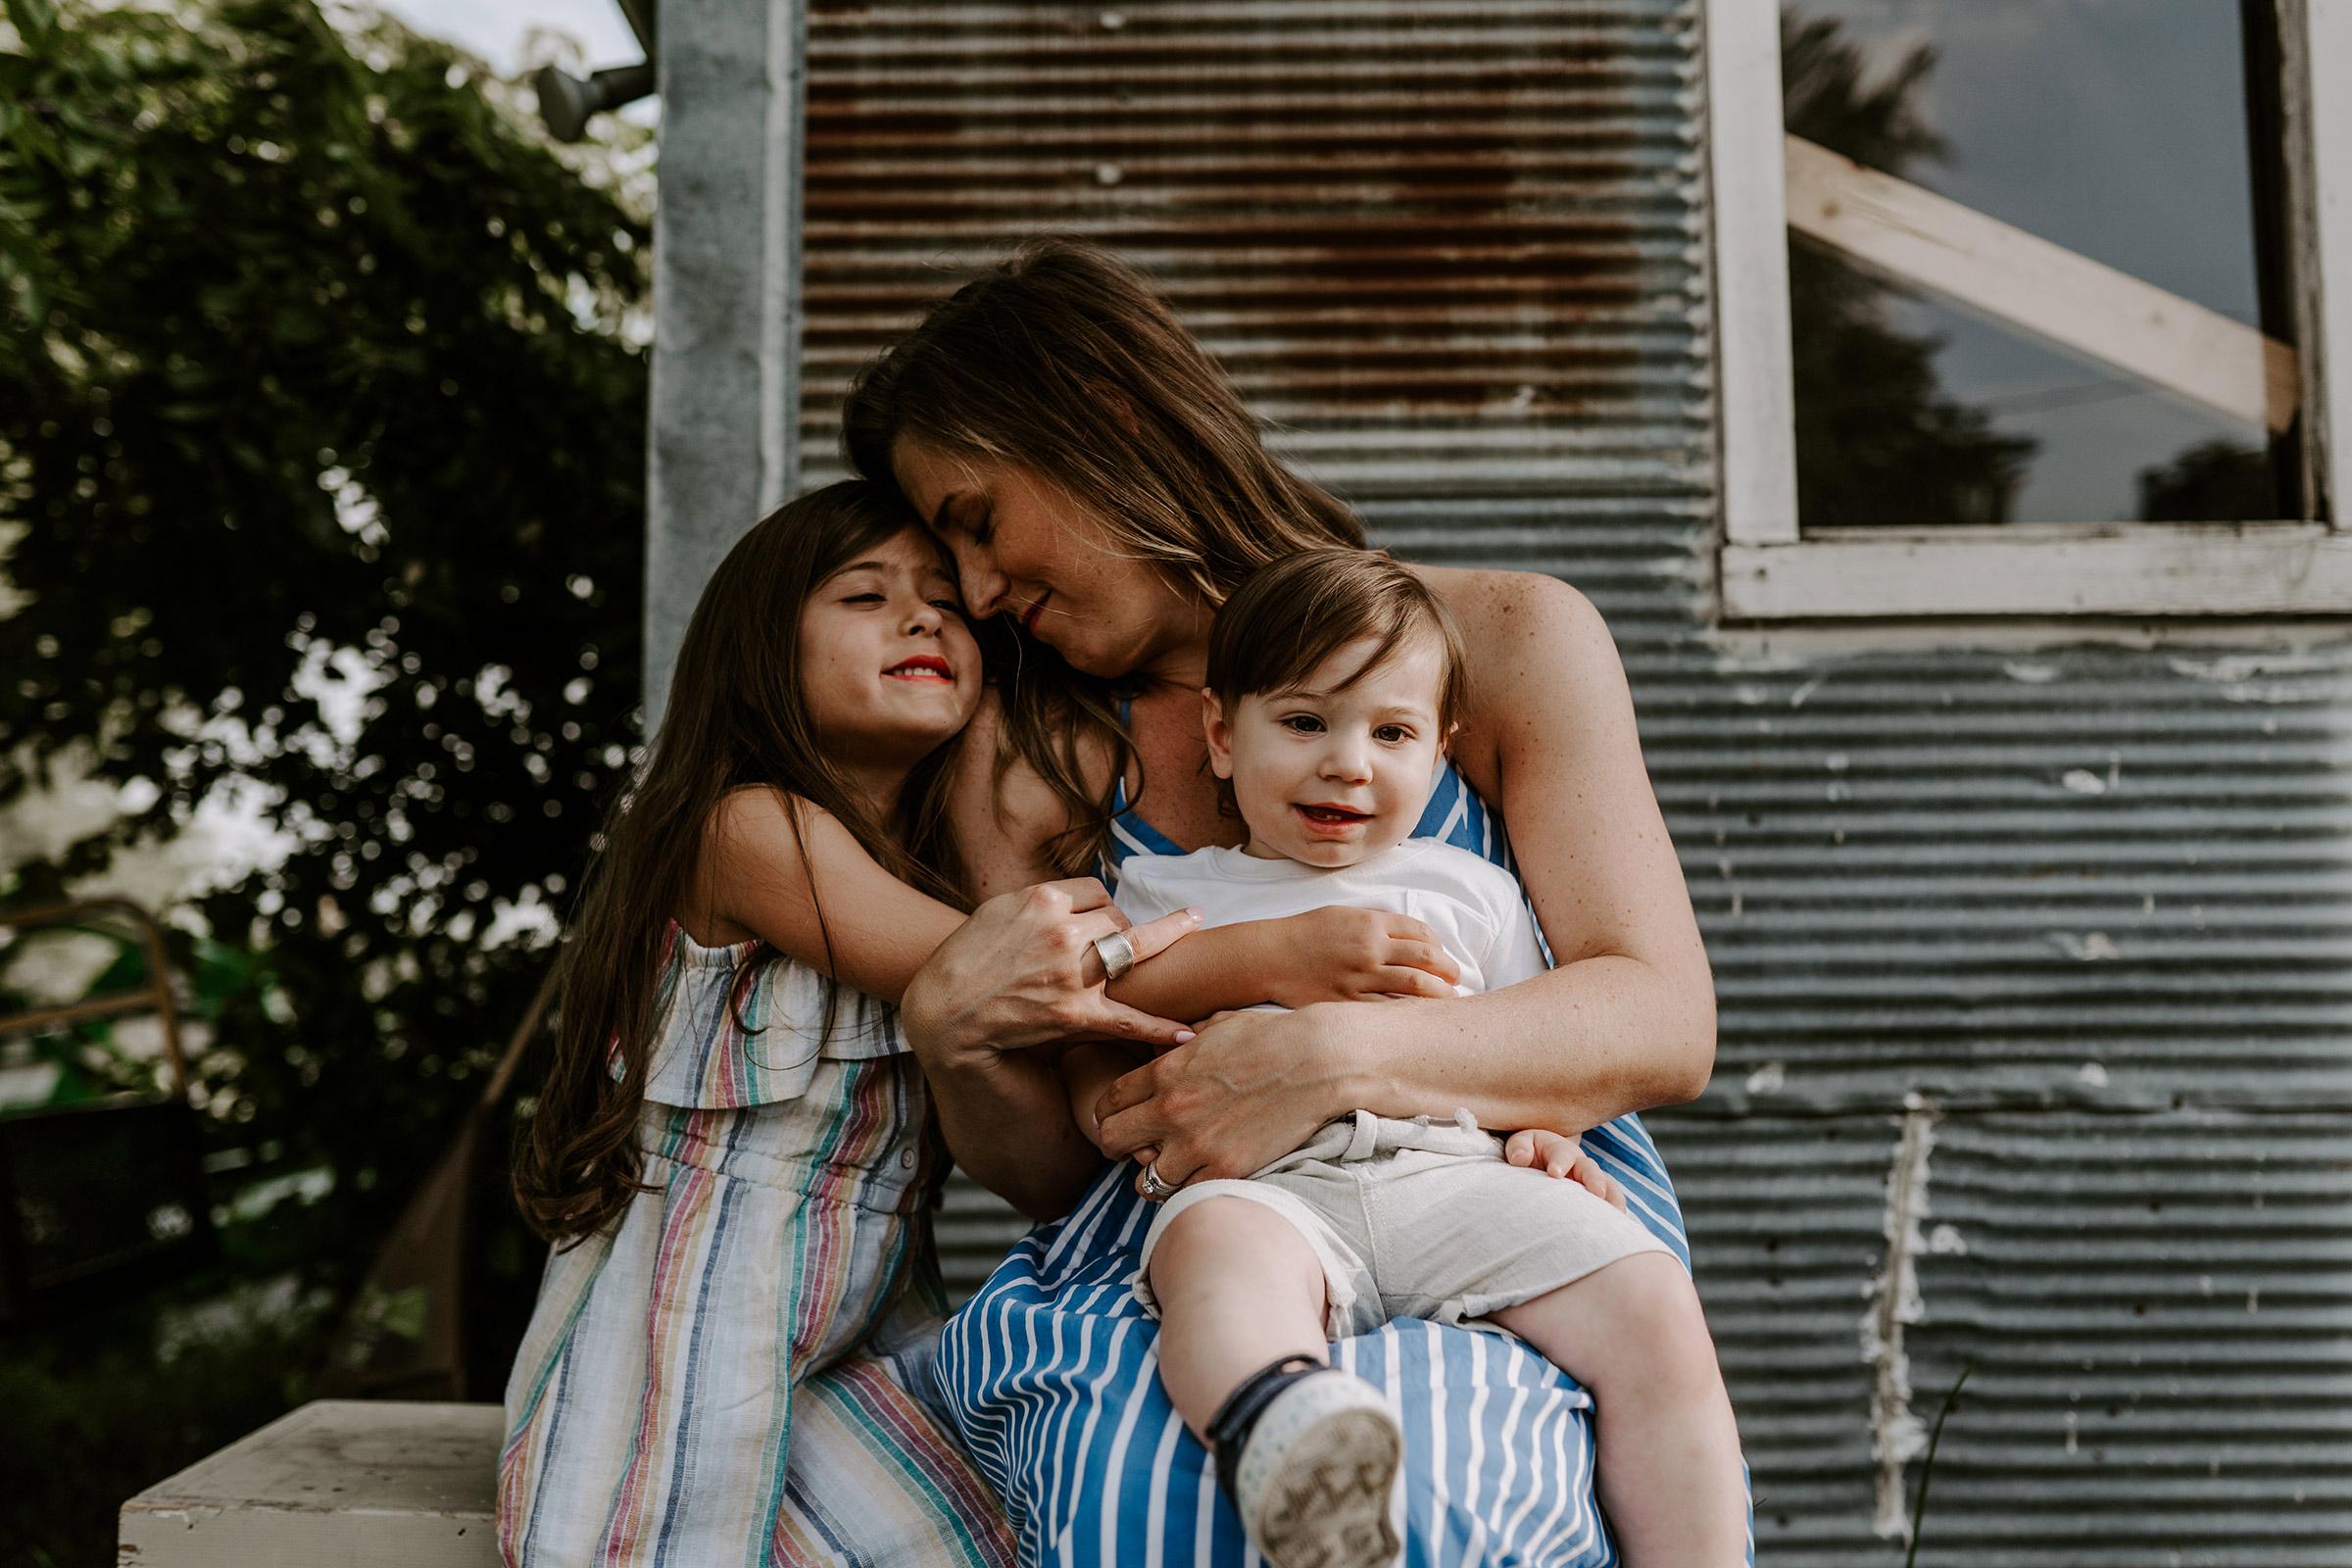 natale-family-mom-holding-two-kids-iris-aisle--winterset-iowa-raelyn-ramey-photography-5.jpg